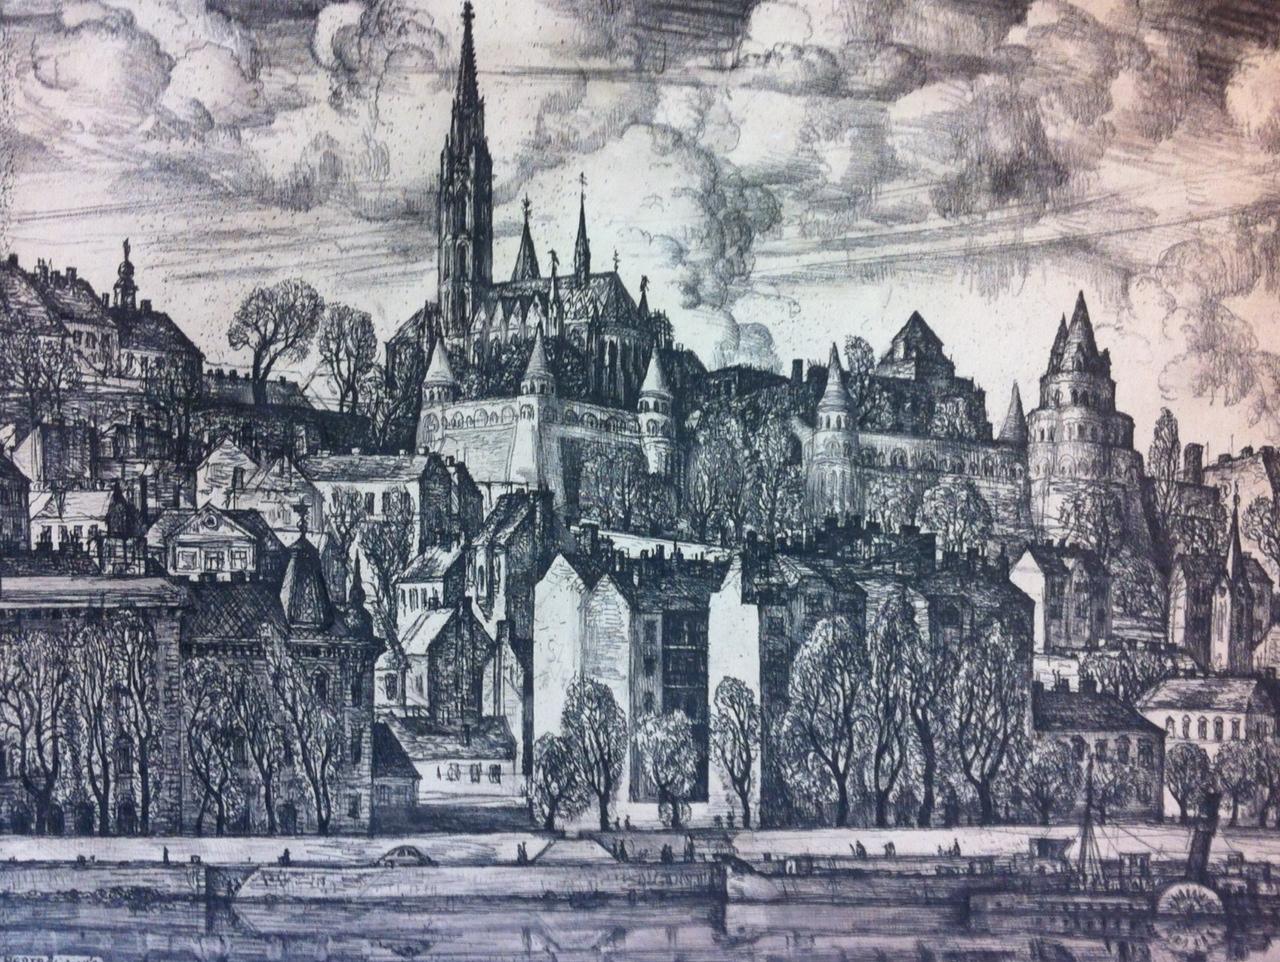 Szabó, Vladimir: The castle from Pest